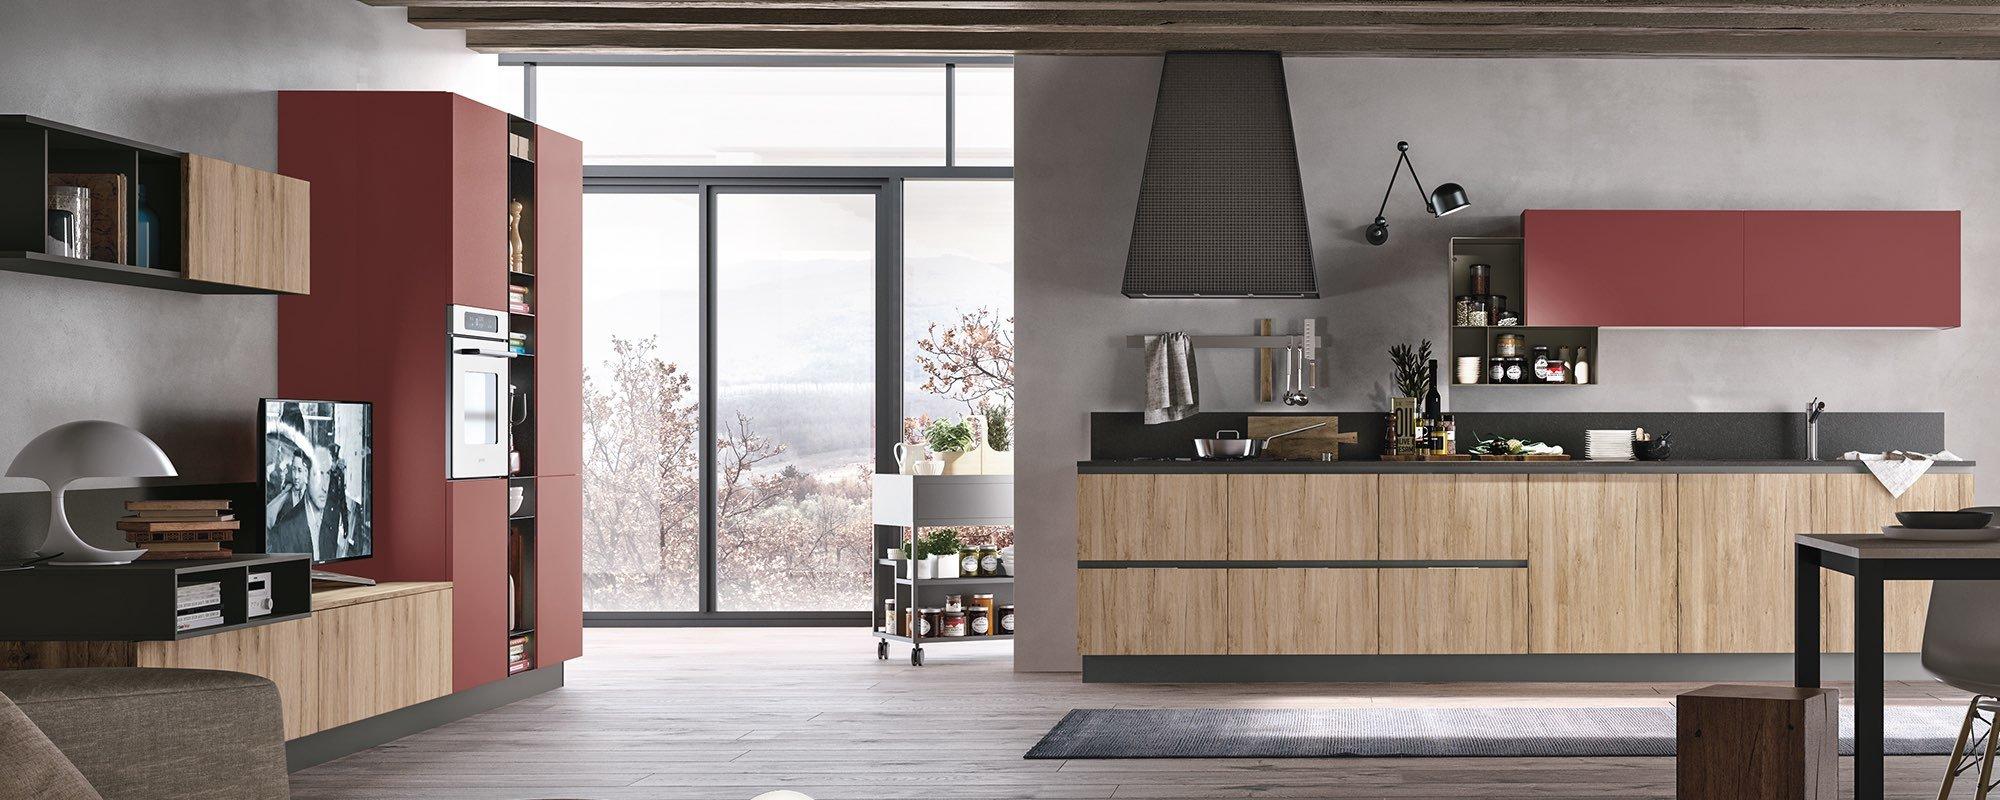 un ambiente con cucina e salotto